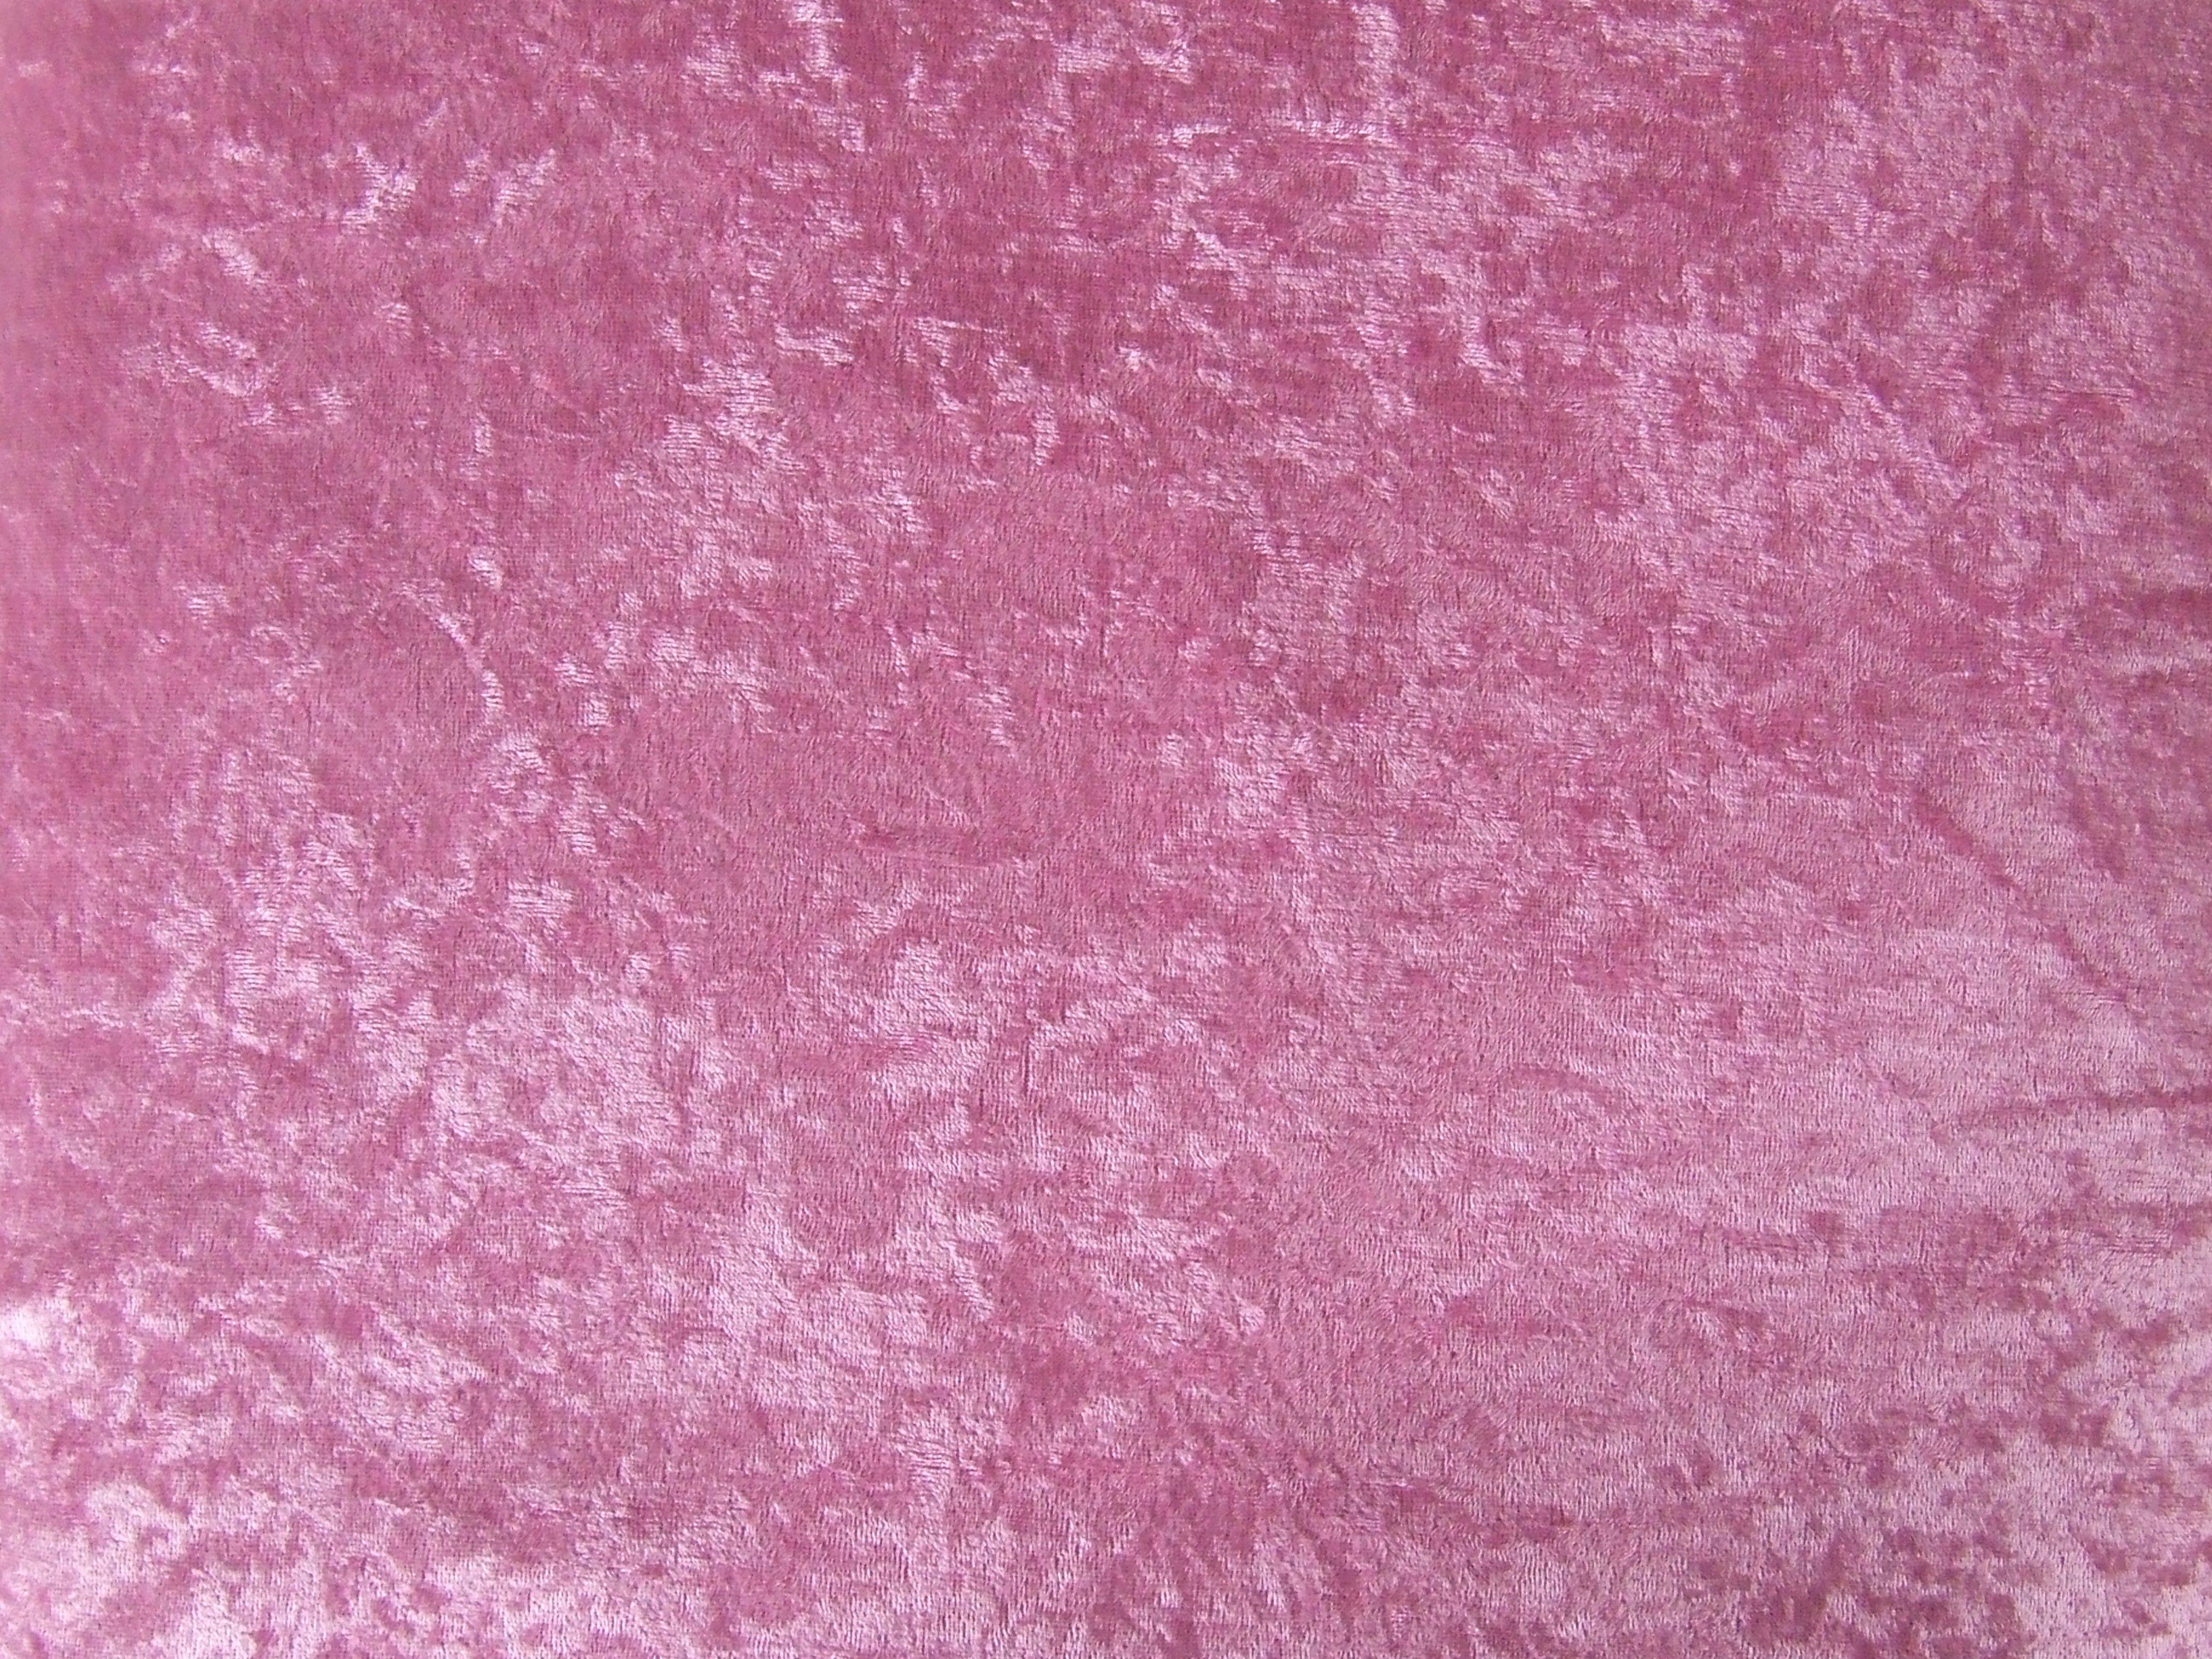 Pink Velvet Wallpapers Top Free Pink Velvet Backgrounds Wallpaperaccess